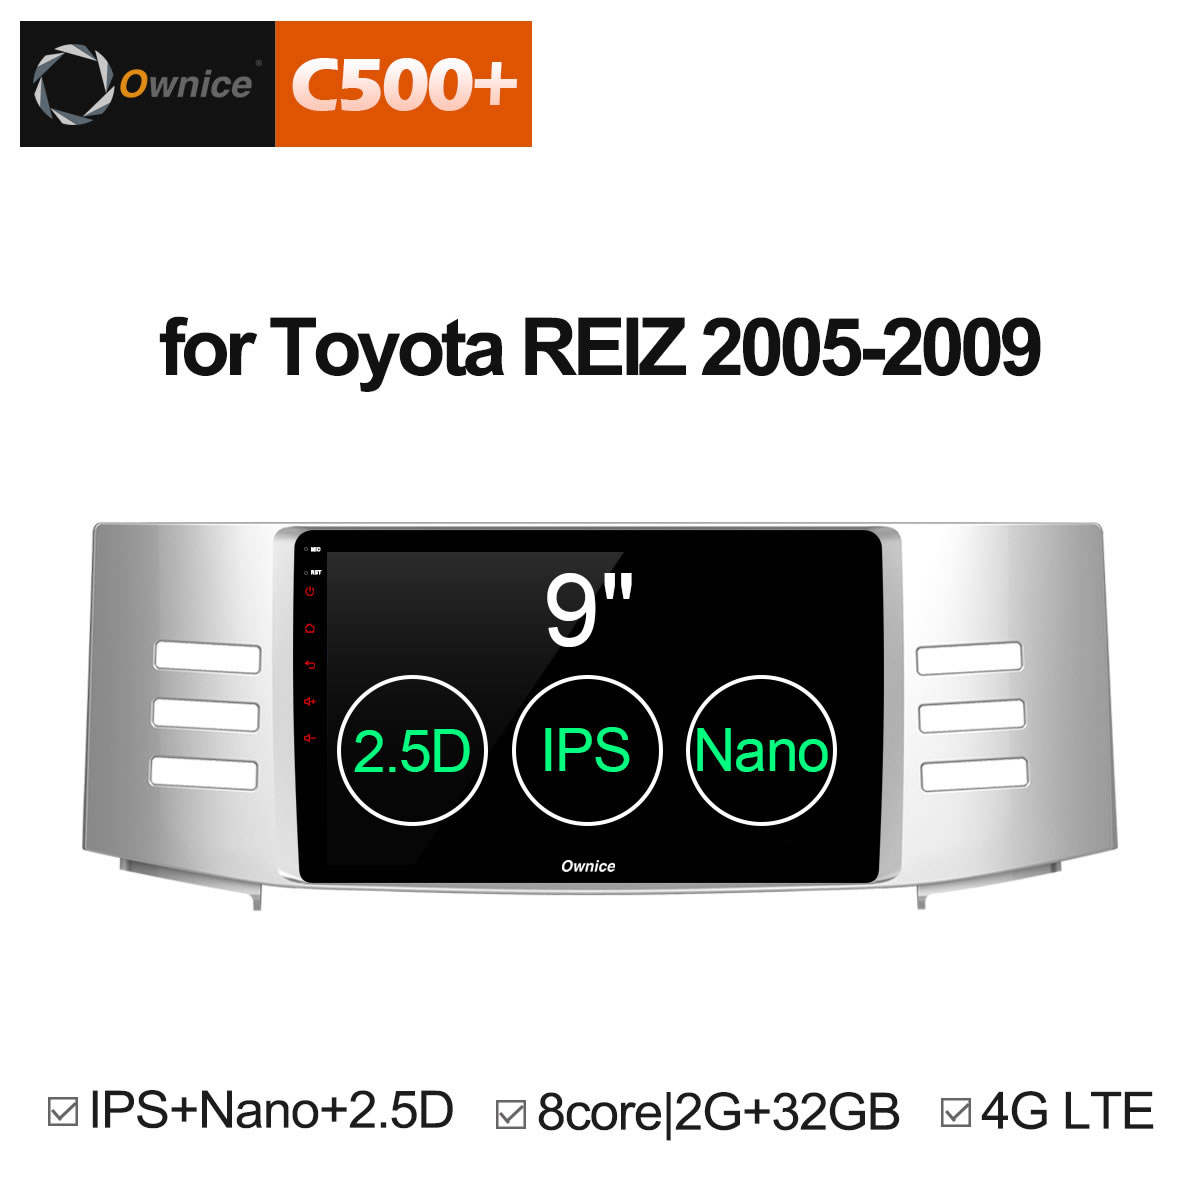 Ownice C500+ G10 Android 8.1 8 Core Car GPS Navi For Toyota Reiz Mark X 2005 2006 2007 2008 2009 Radio DVD Player 4G SIM Card ownice c500 4g sim lte octa 8 core android 6 0 for kia ceed 2013 2015 car dvd player gps navi radio wifi 4g bt 2gb ram 32g rom